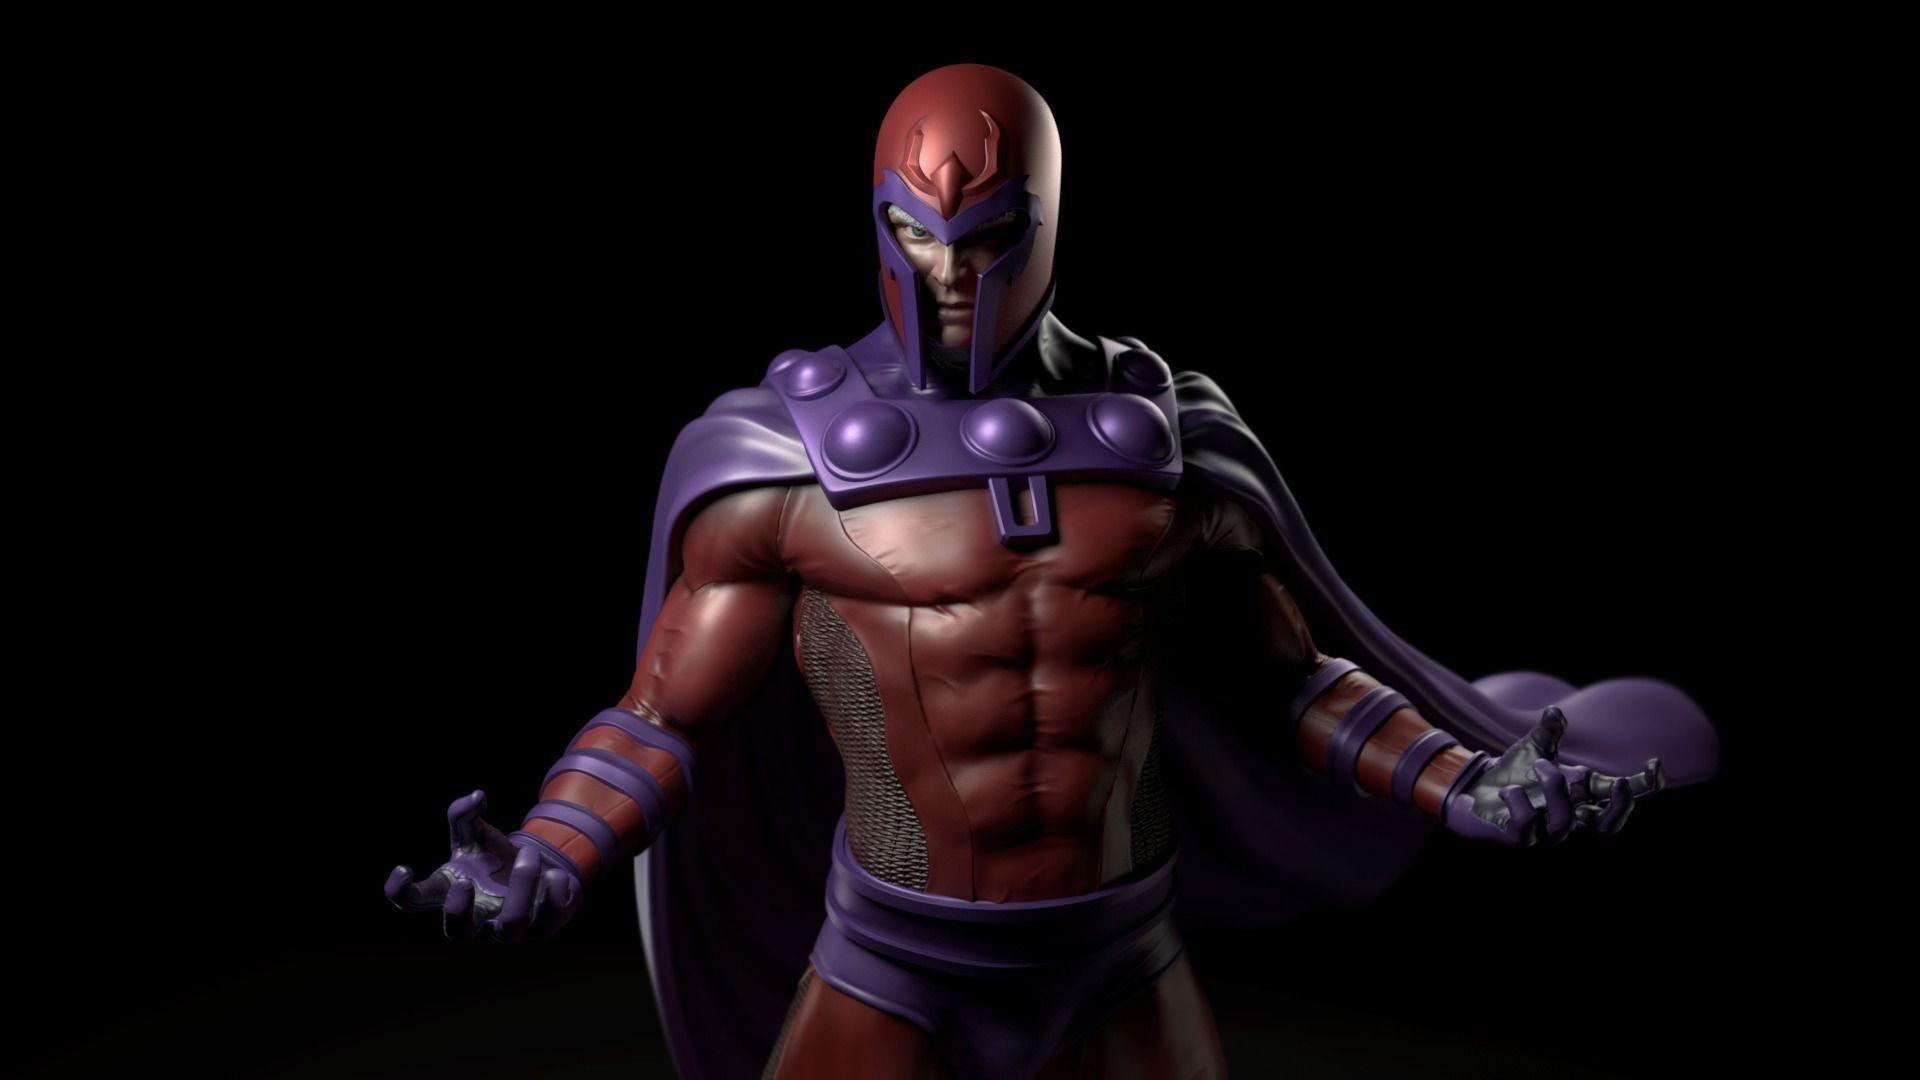 Magneto Fan Art Statue for Print